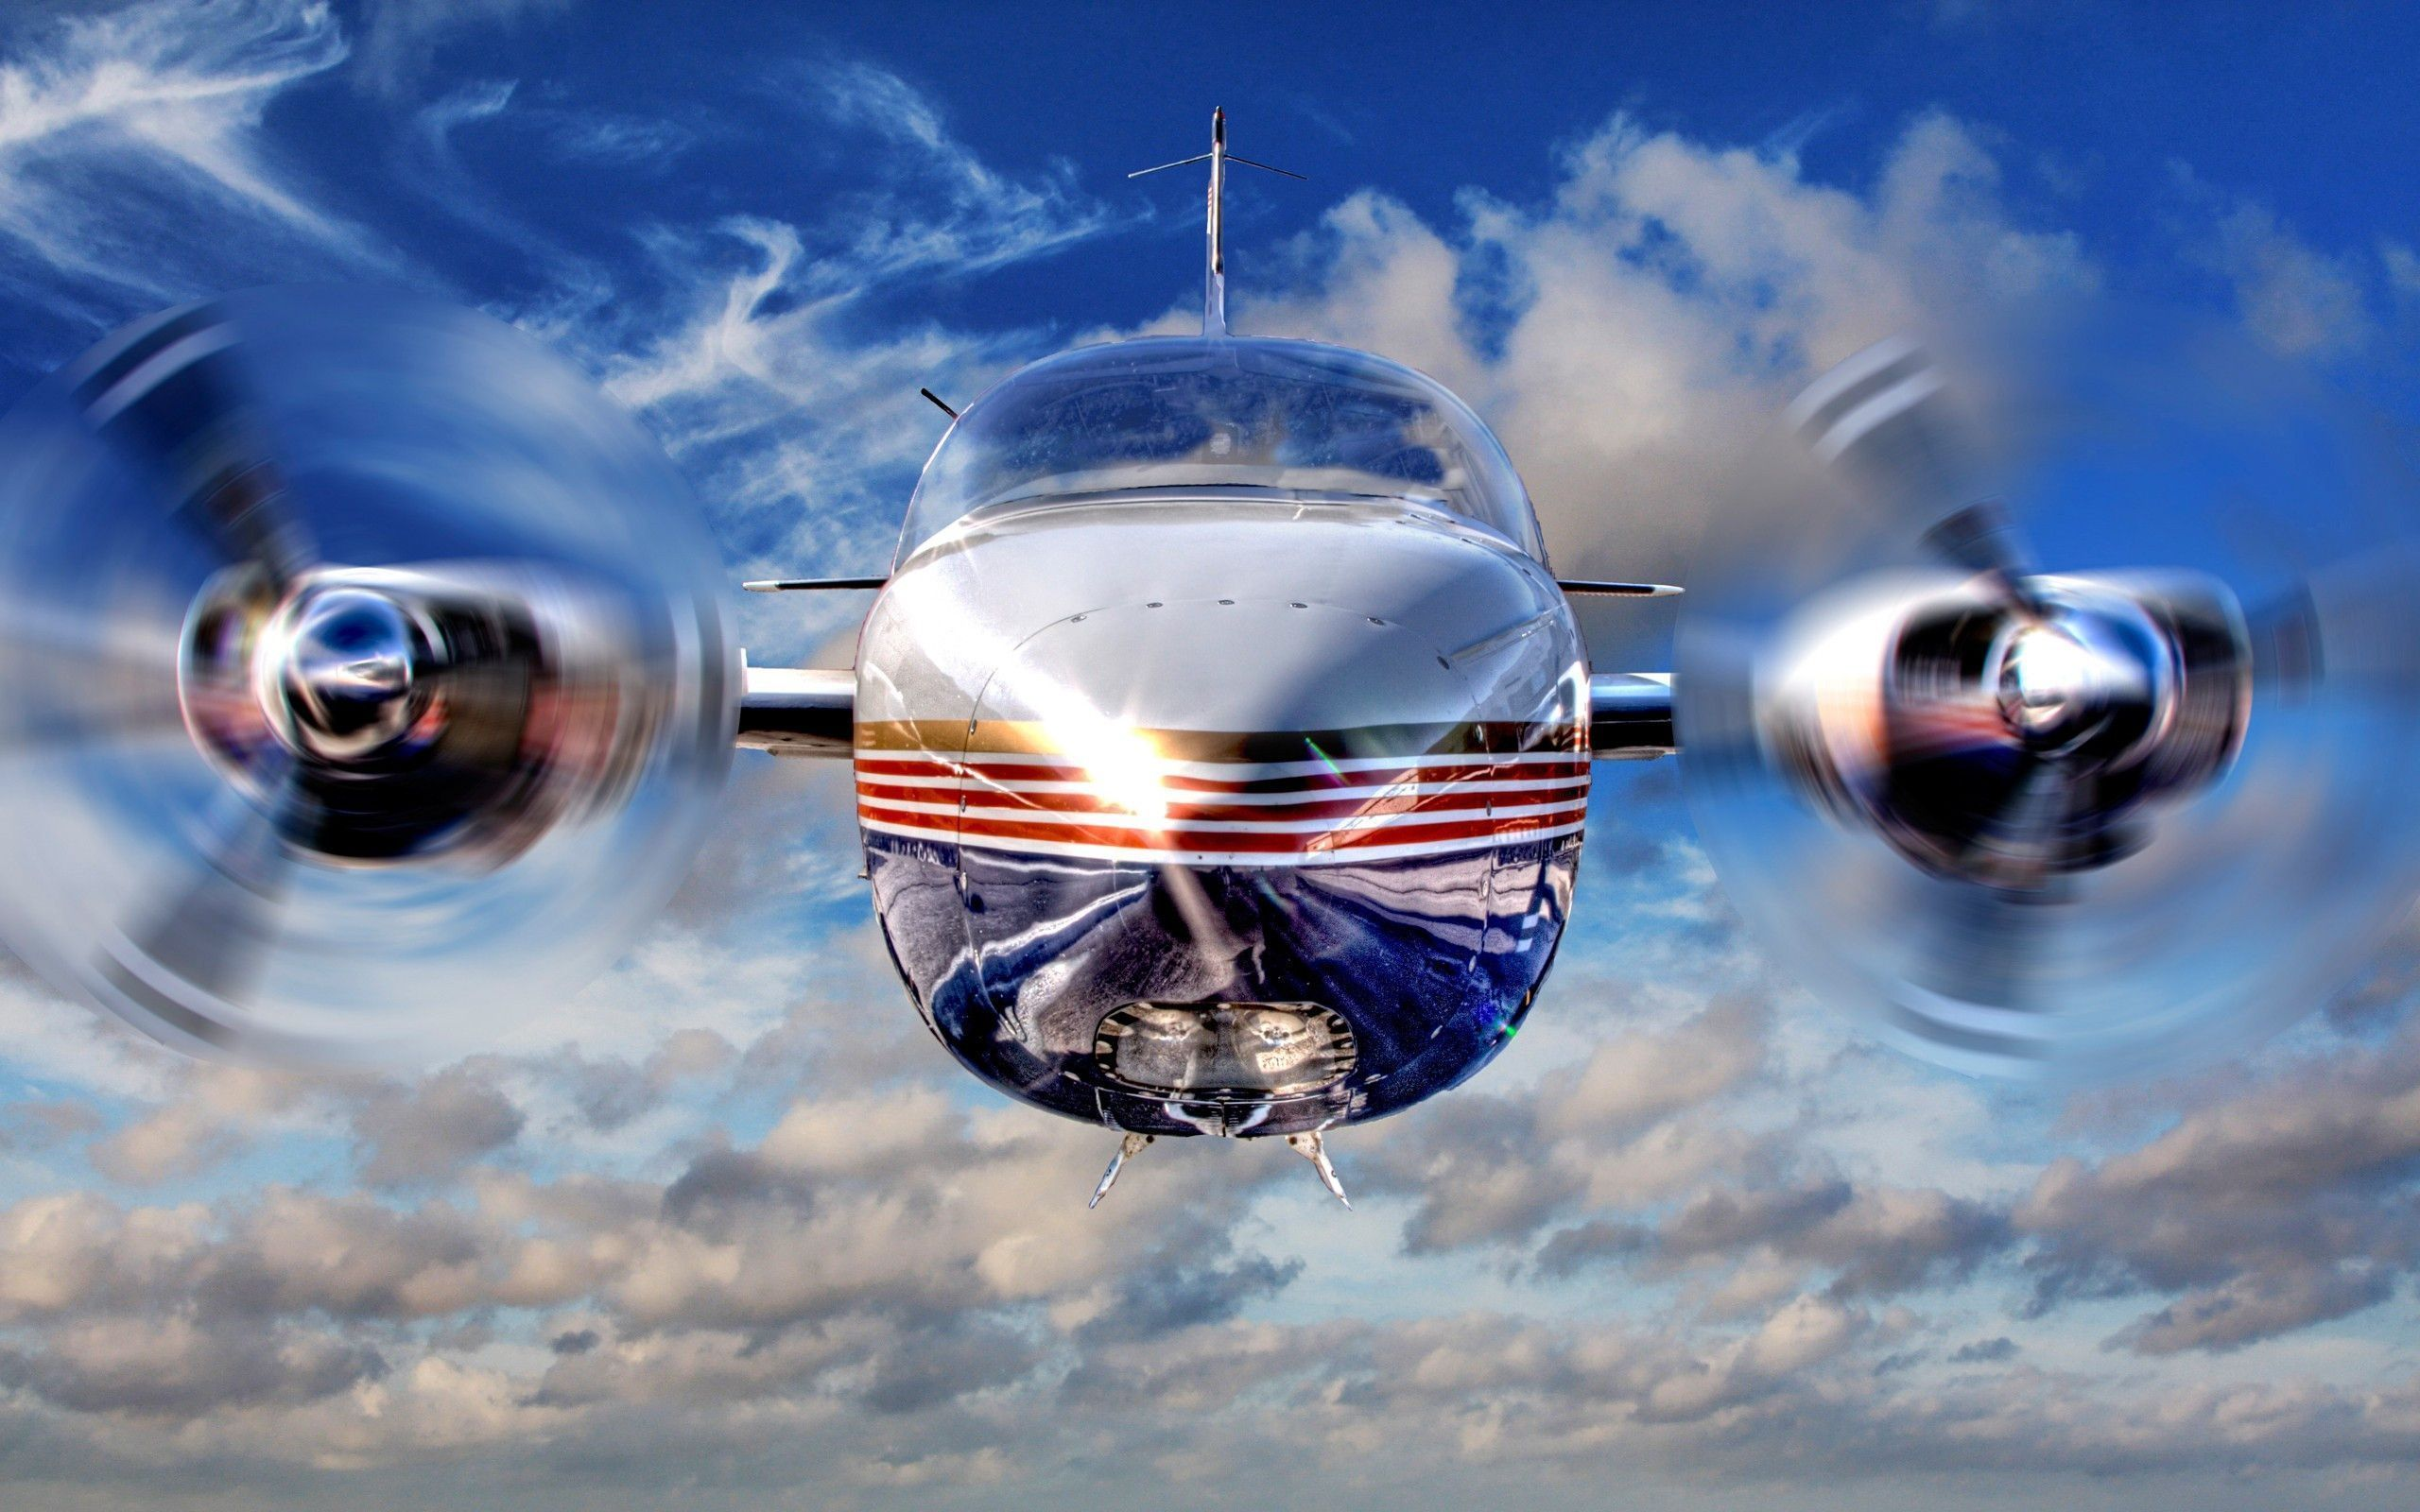 Aircraft Wallpapers Hd Airplane Wallpaper Aviation Forum Aviation